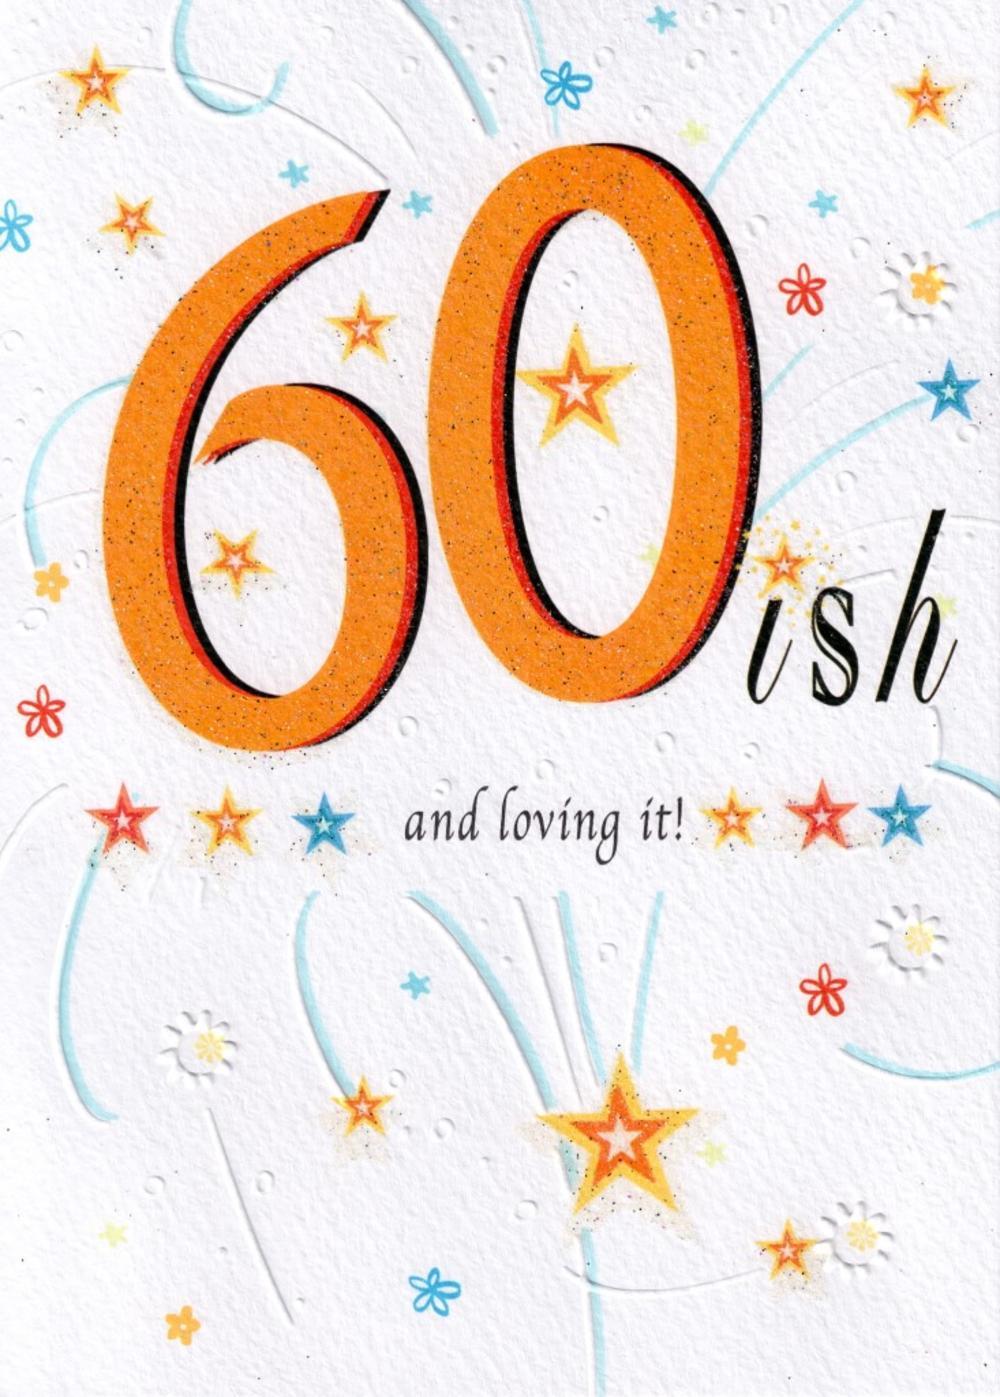 60 ish Loving It Happy 60th Birthday Card Cards Love Kates